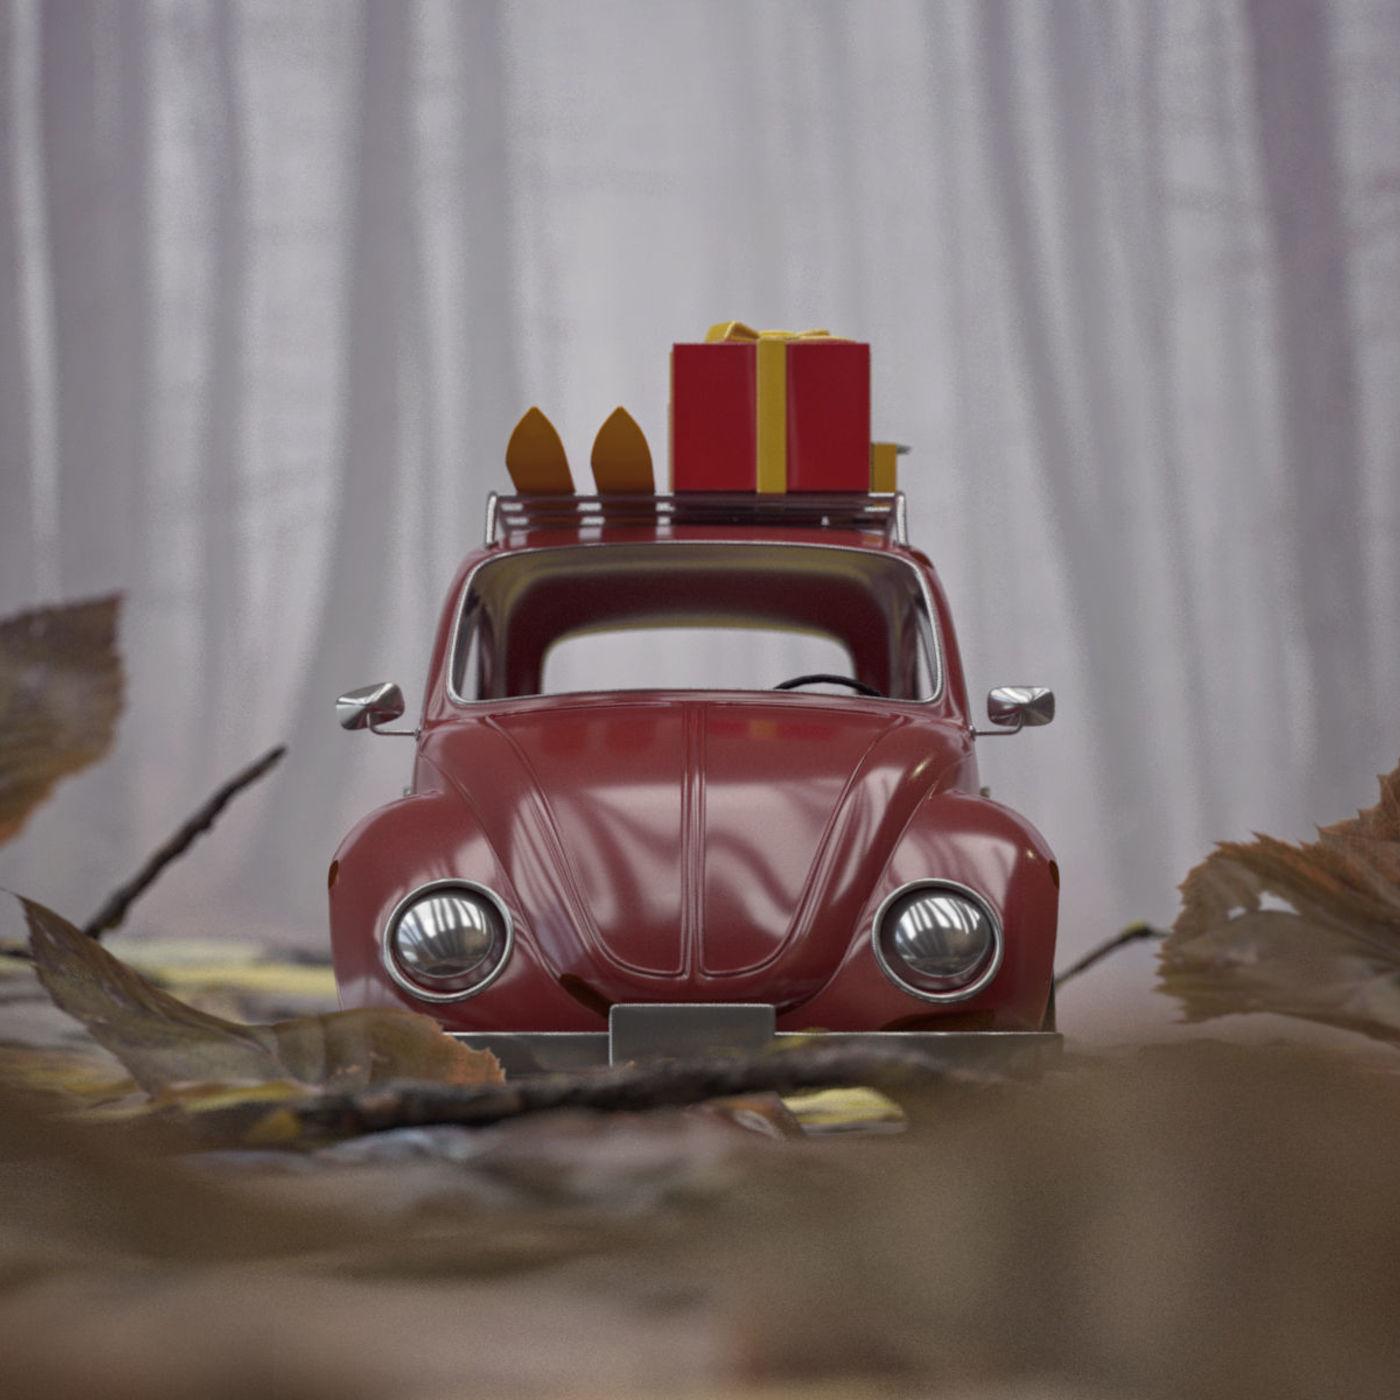 little cars